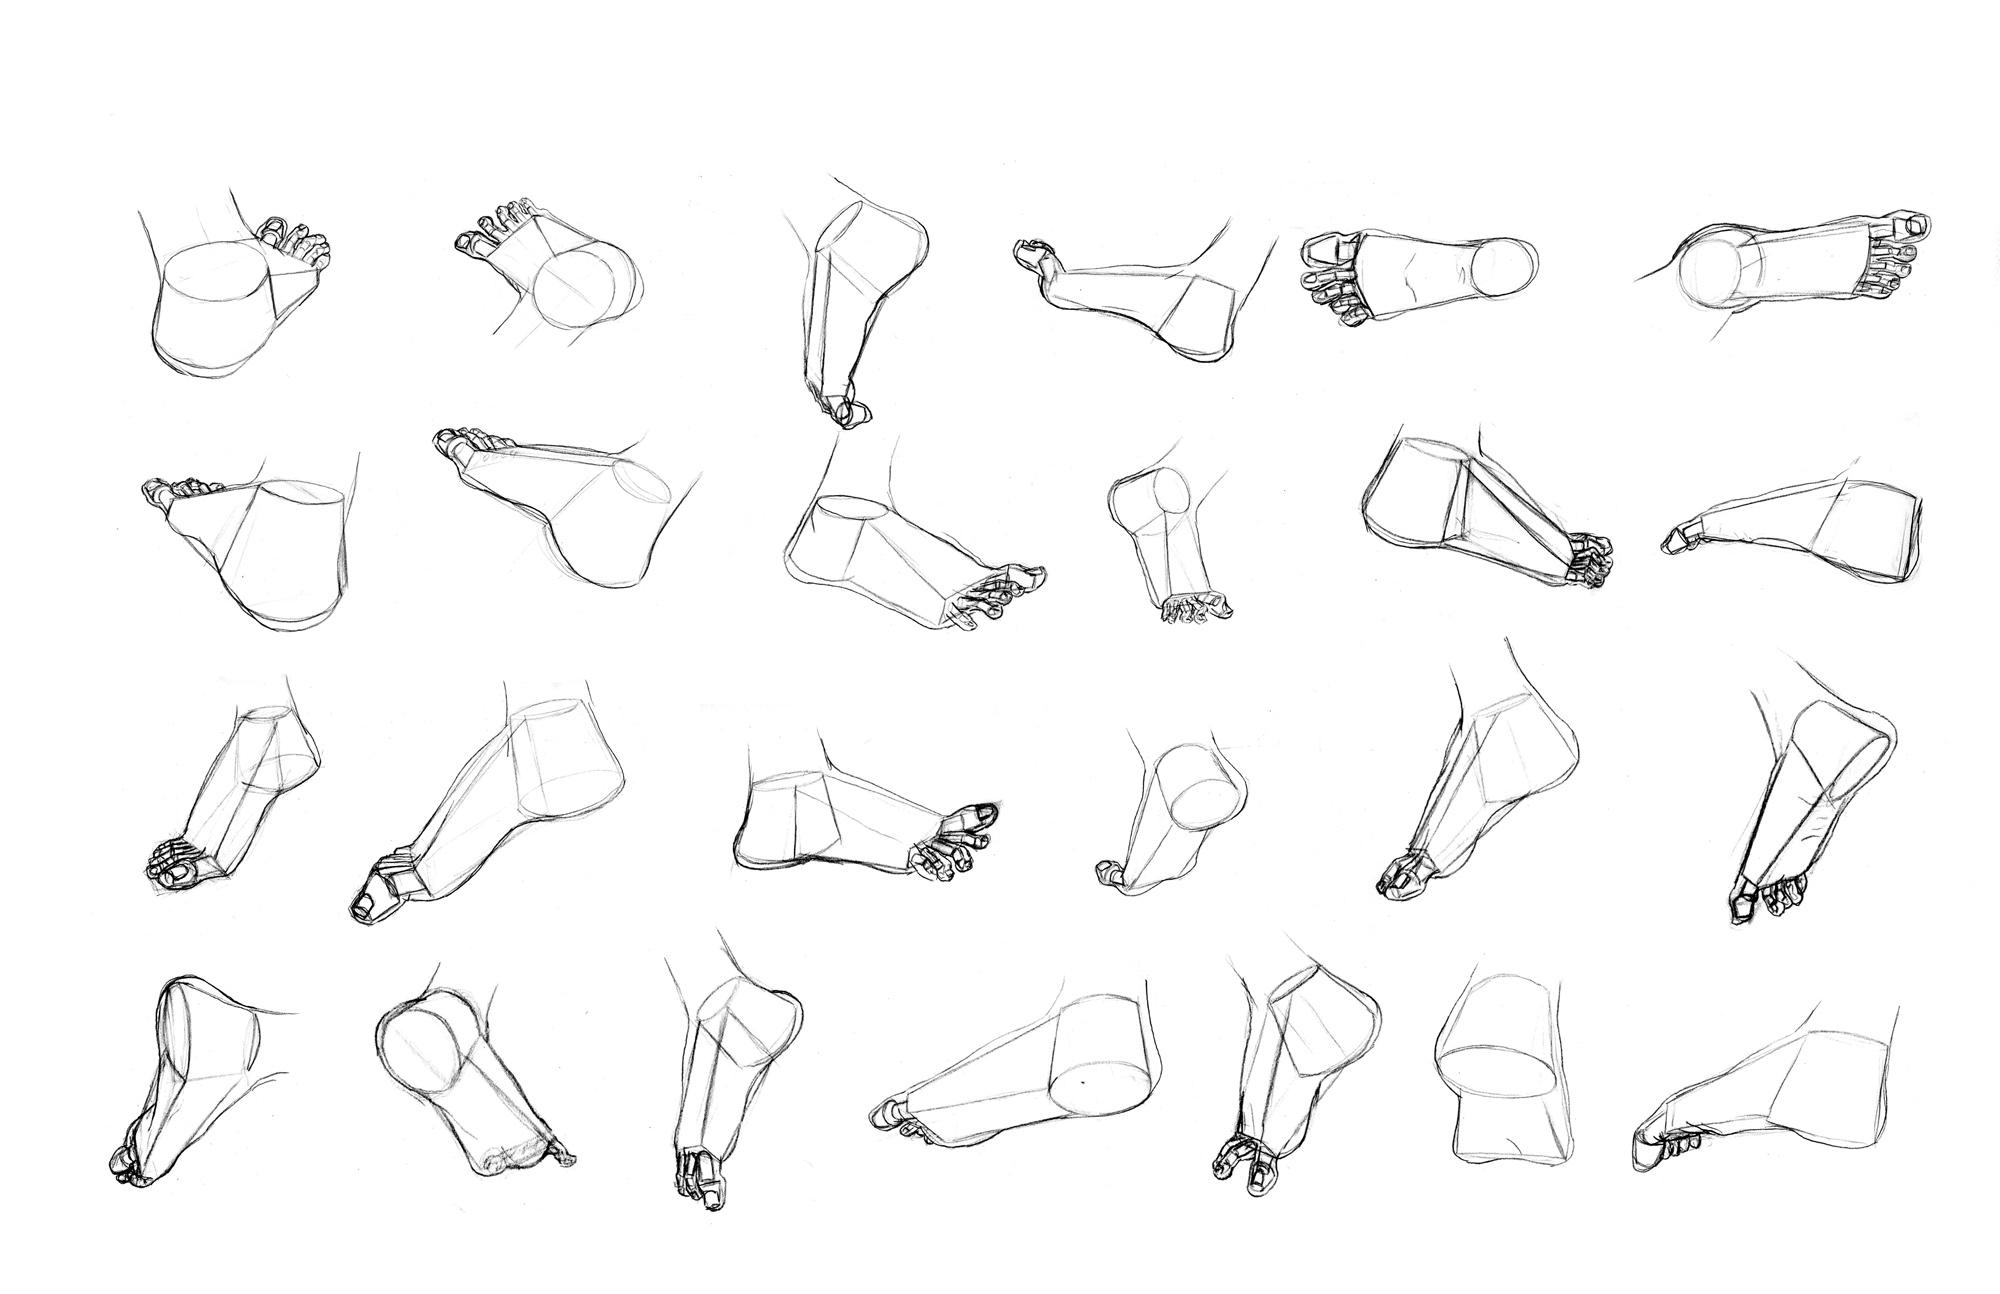 Feet Poses